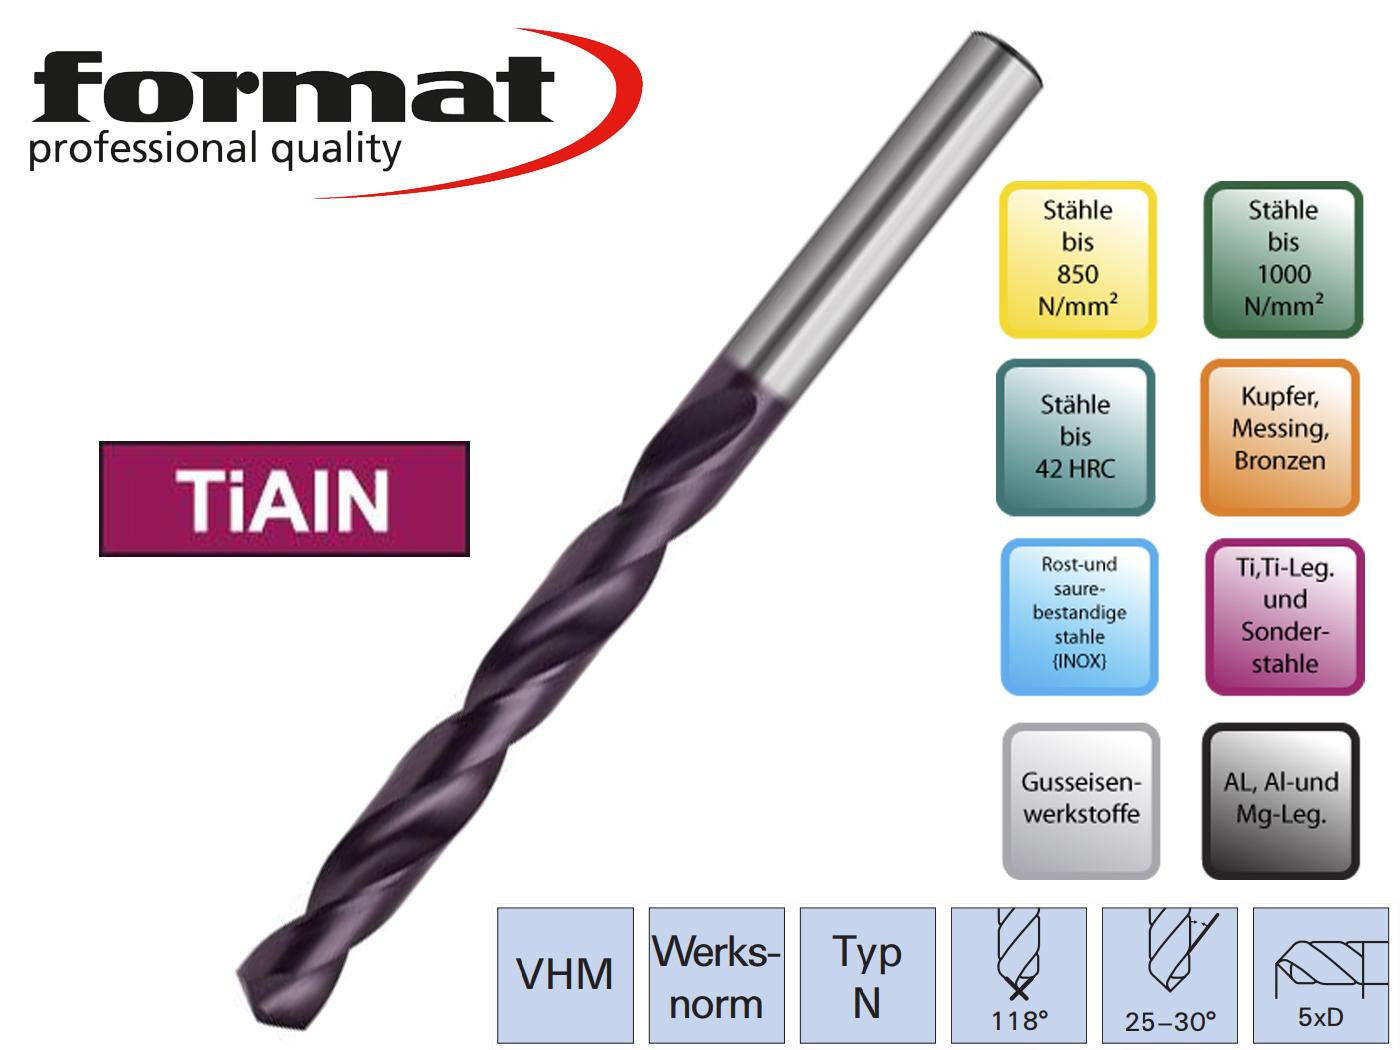 Spiraalboor VHM DIN 338 N VHM TiALN   DKMTools - DKM Tools